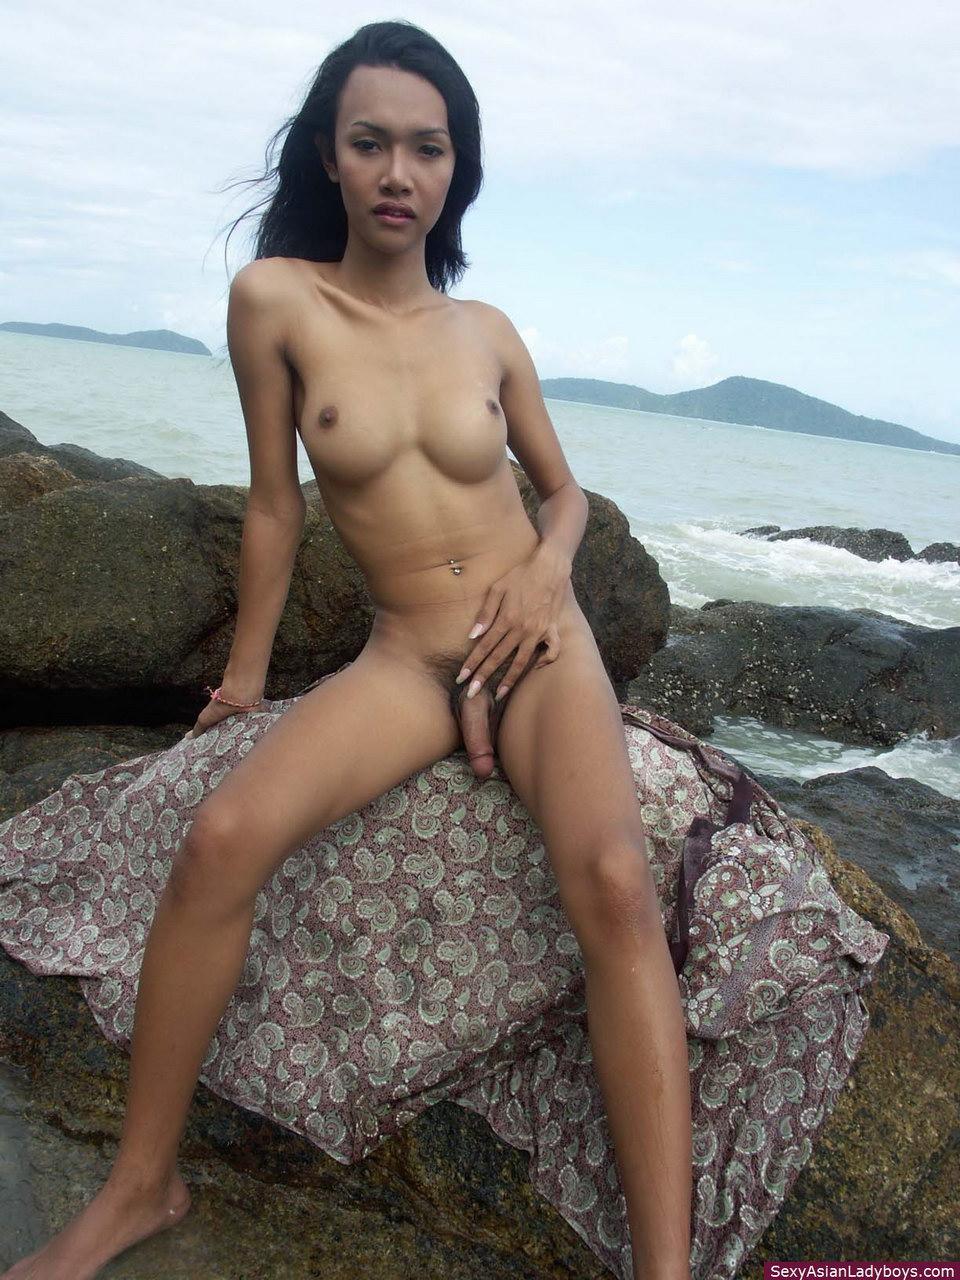 free gay asian men pics